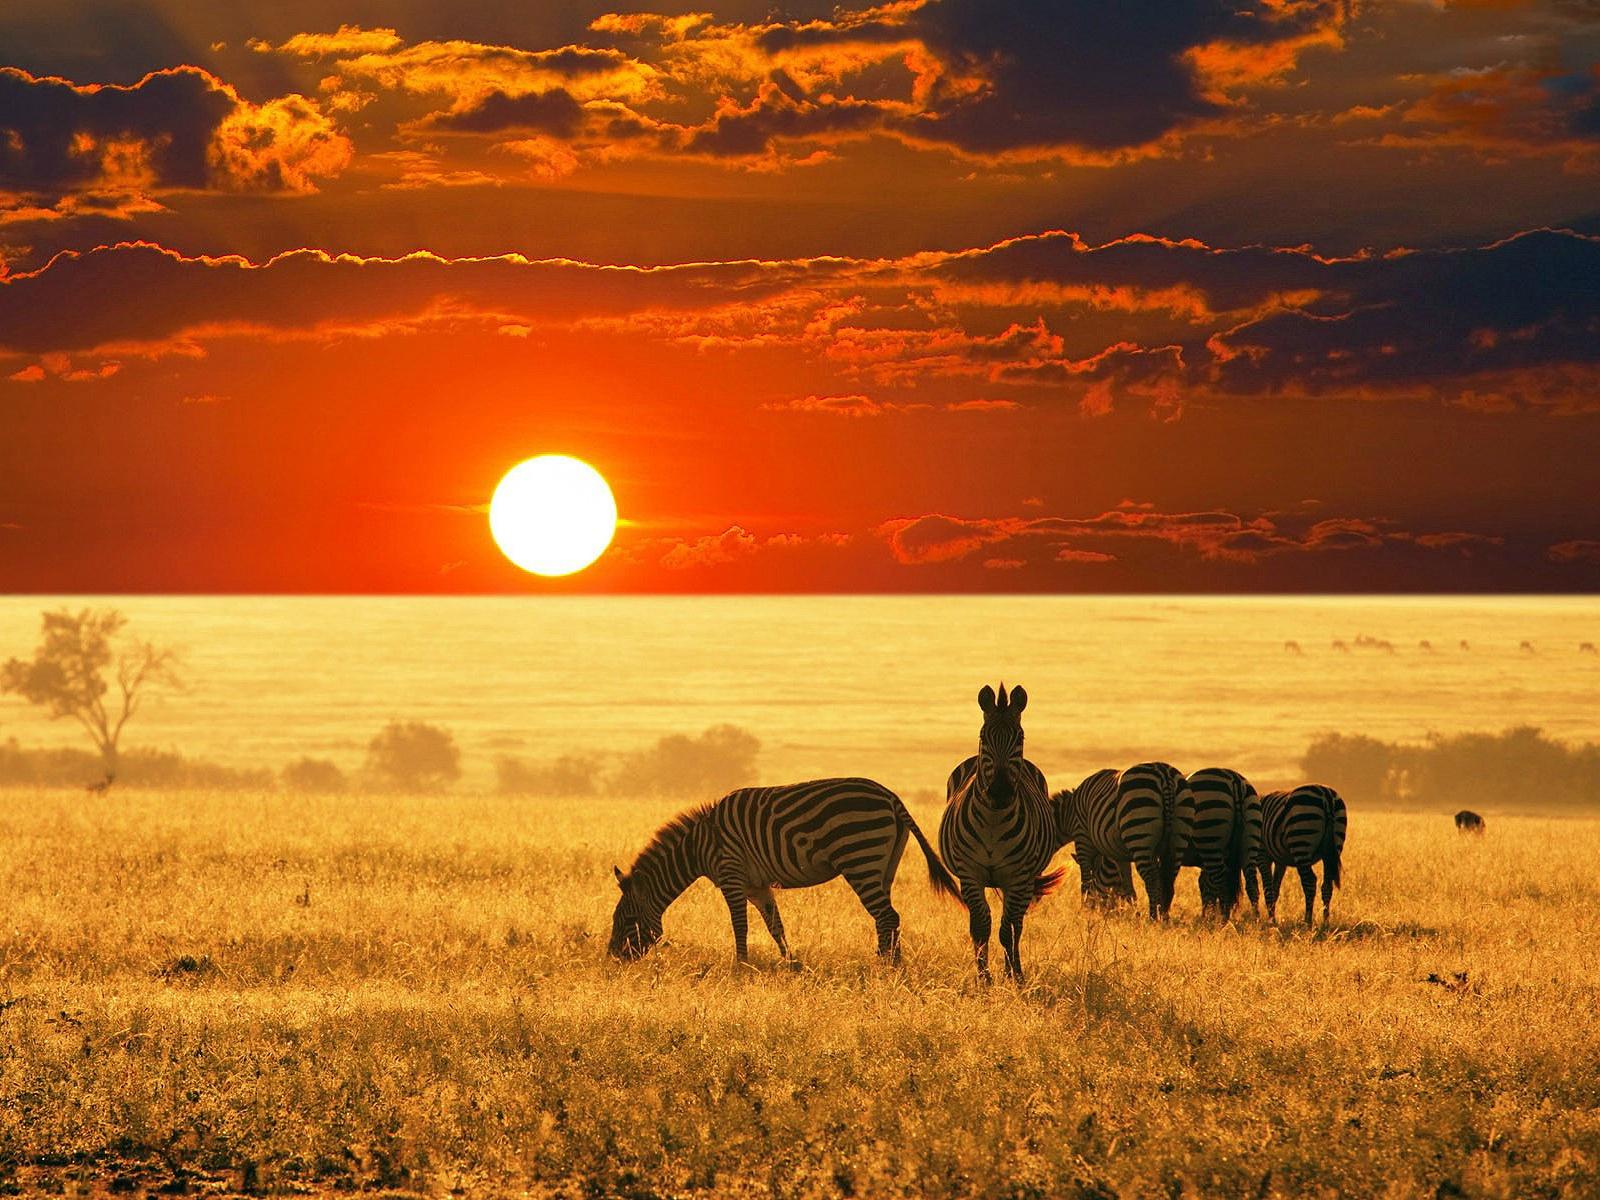 africa wallpaper,wildlife,savanna,grassland,sky,natural environment